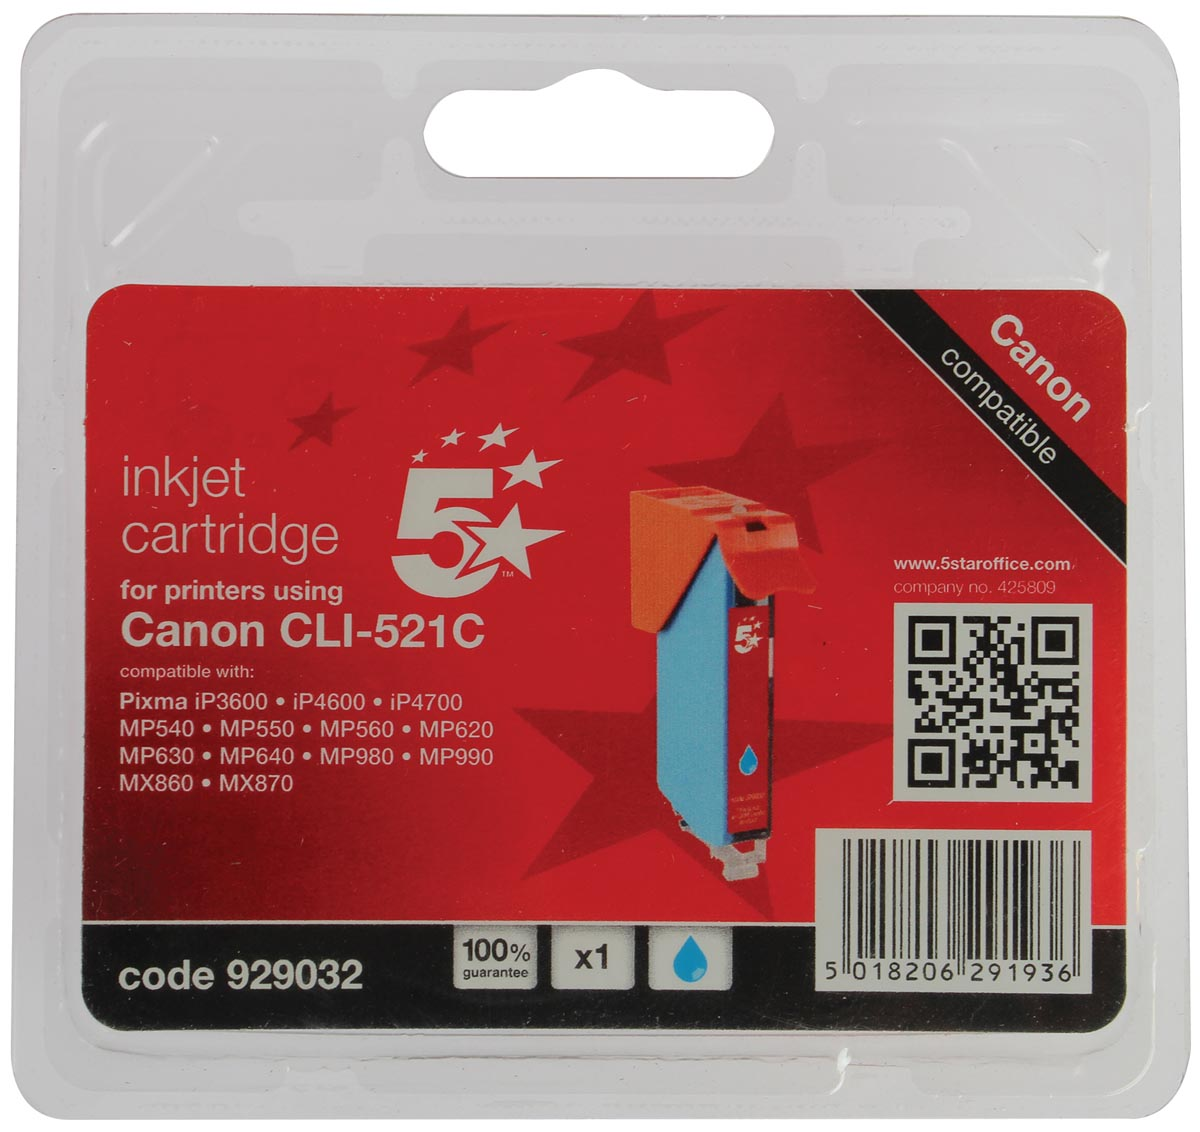 5 Star inktcartridge cyaan, 448 pagina's voor Canon CLI-521C - OEM: 2934B001